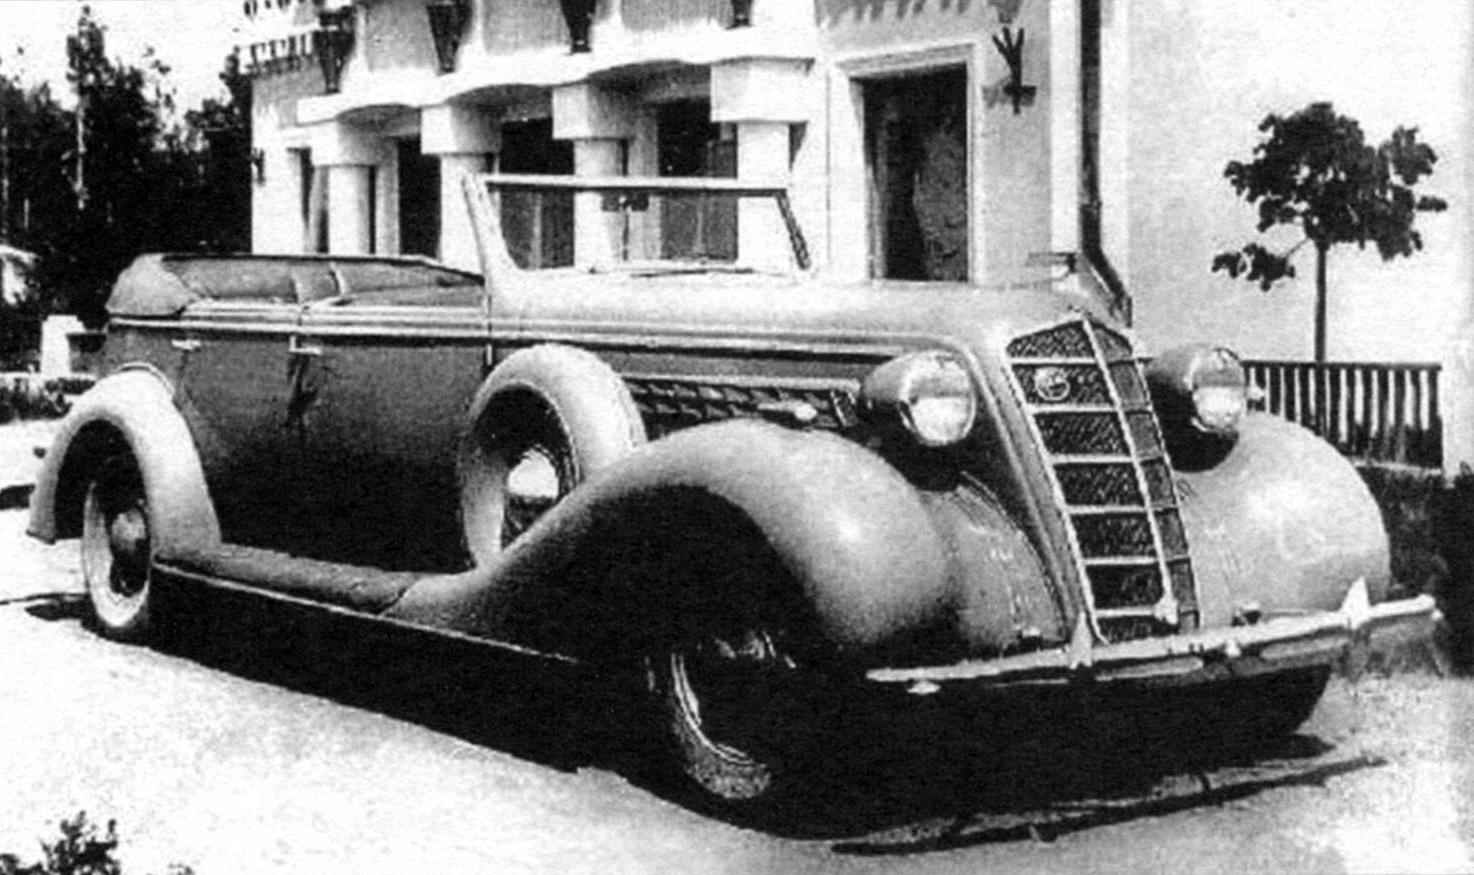 Автомобиль ЗИС-102